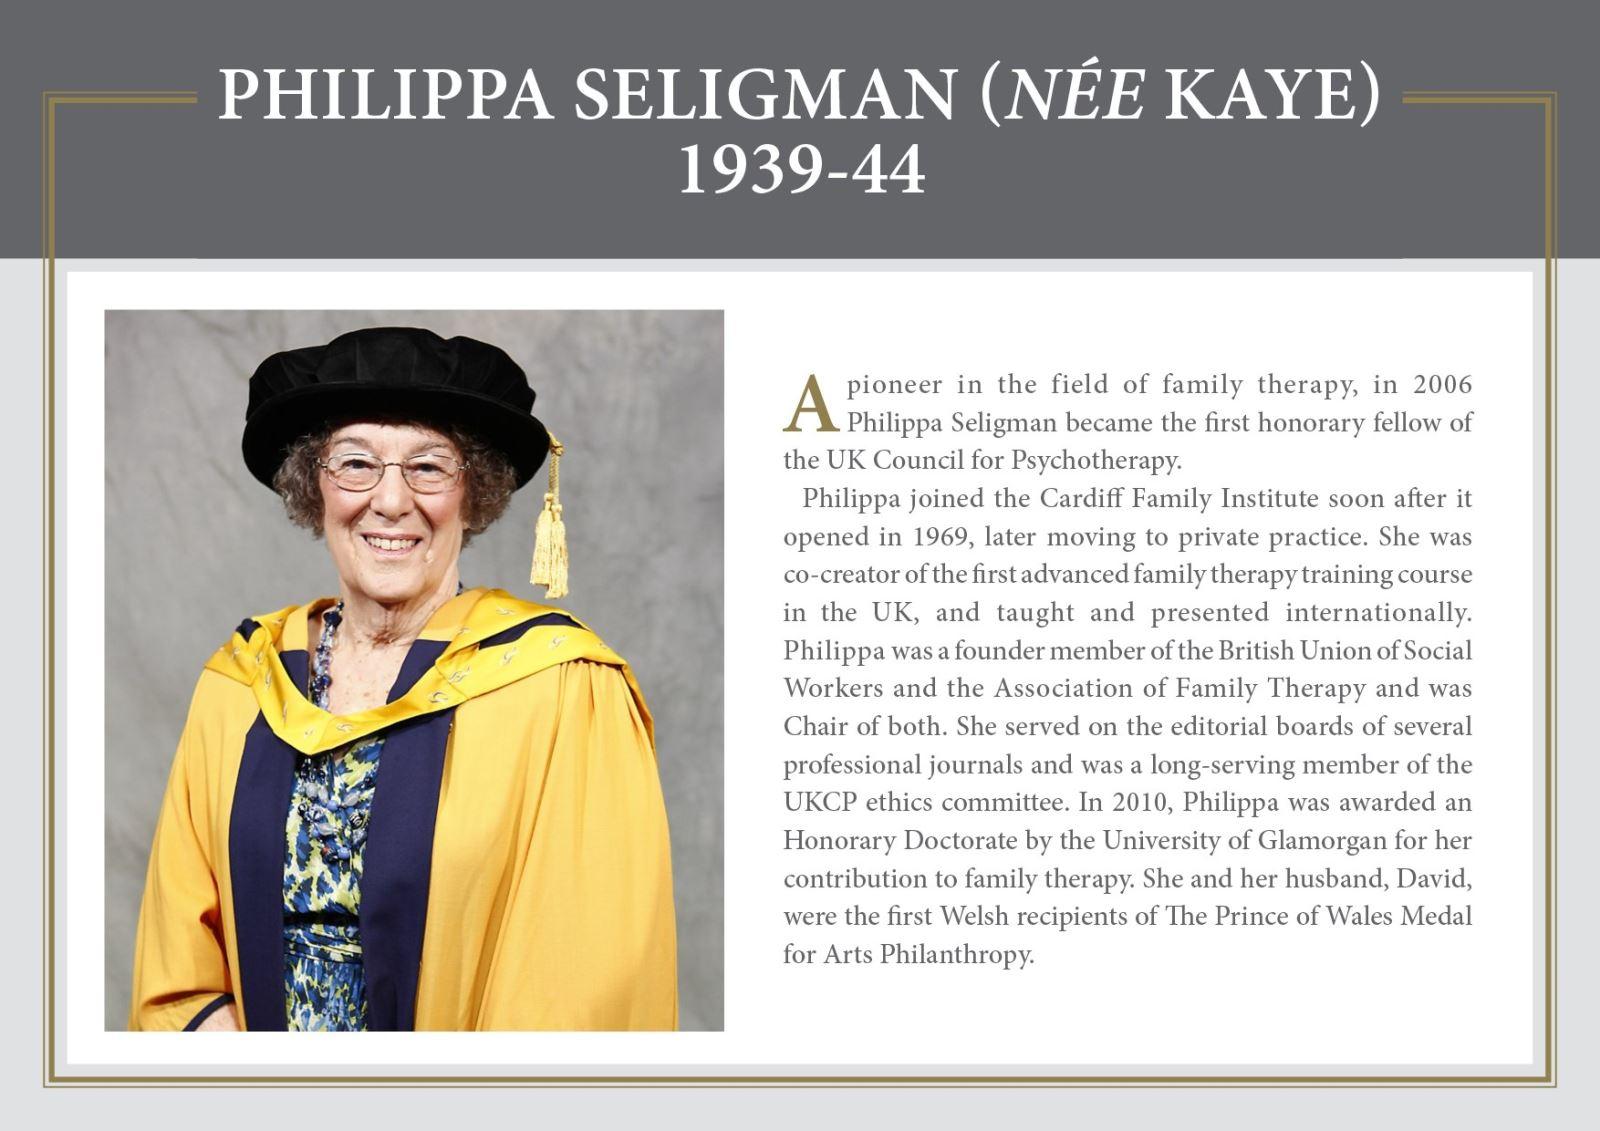 Phillipa Seligman